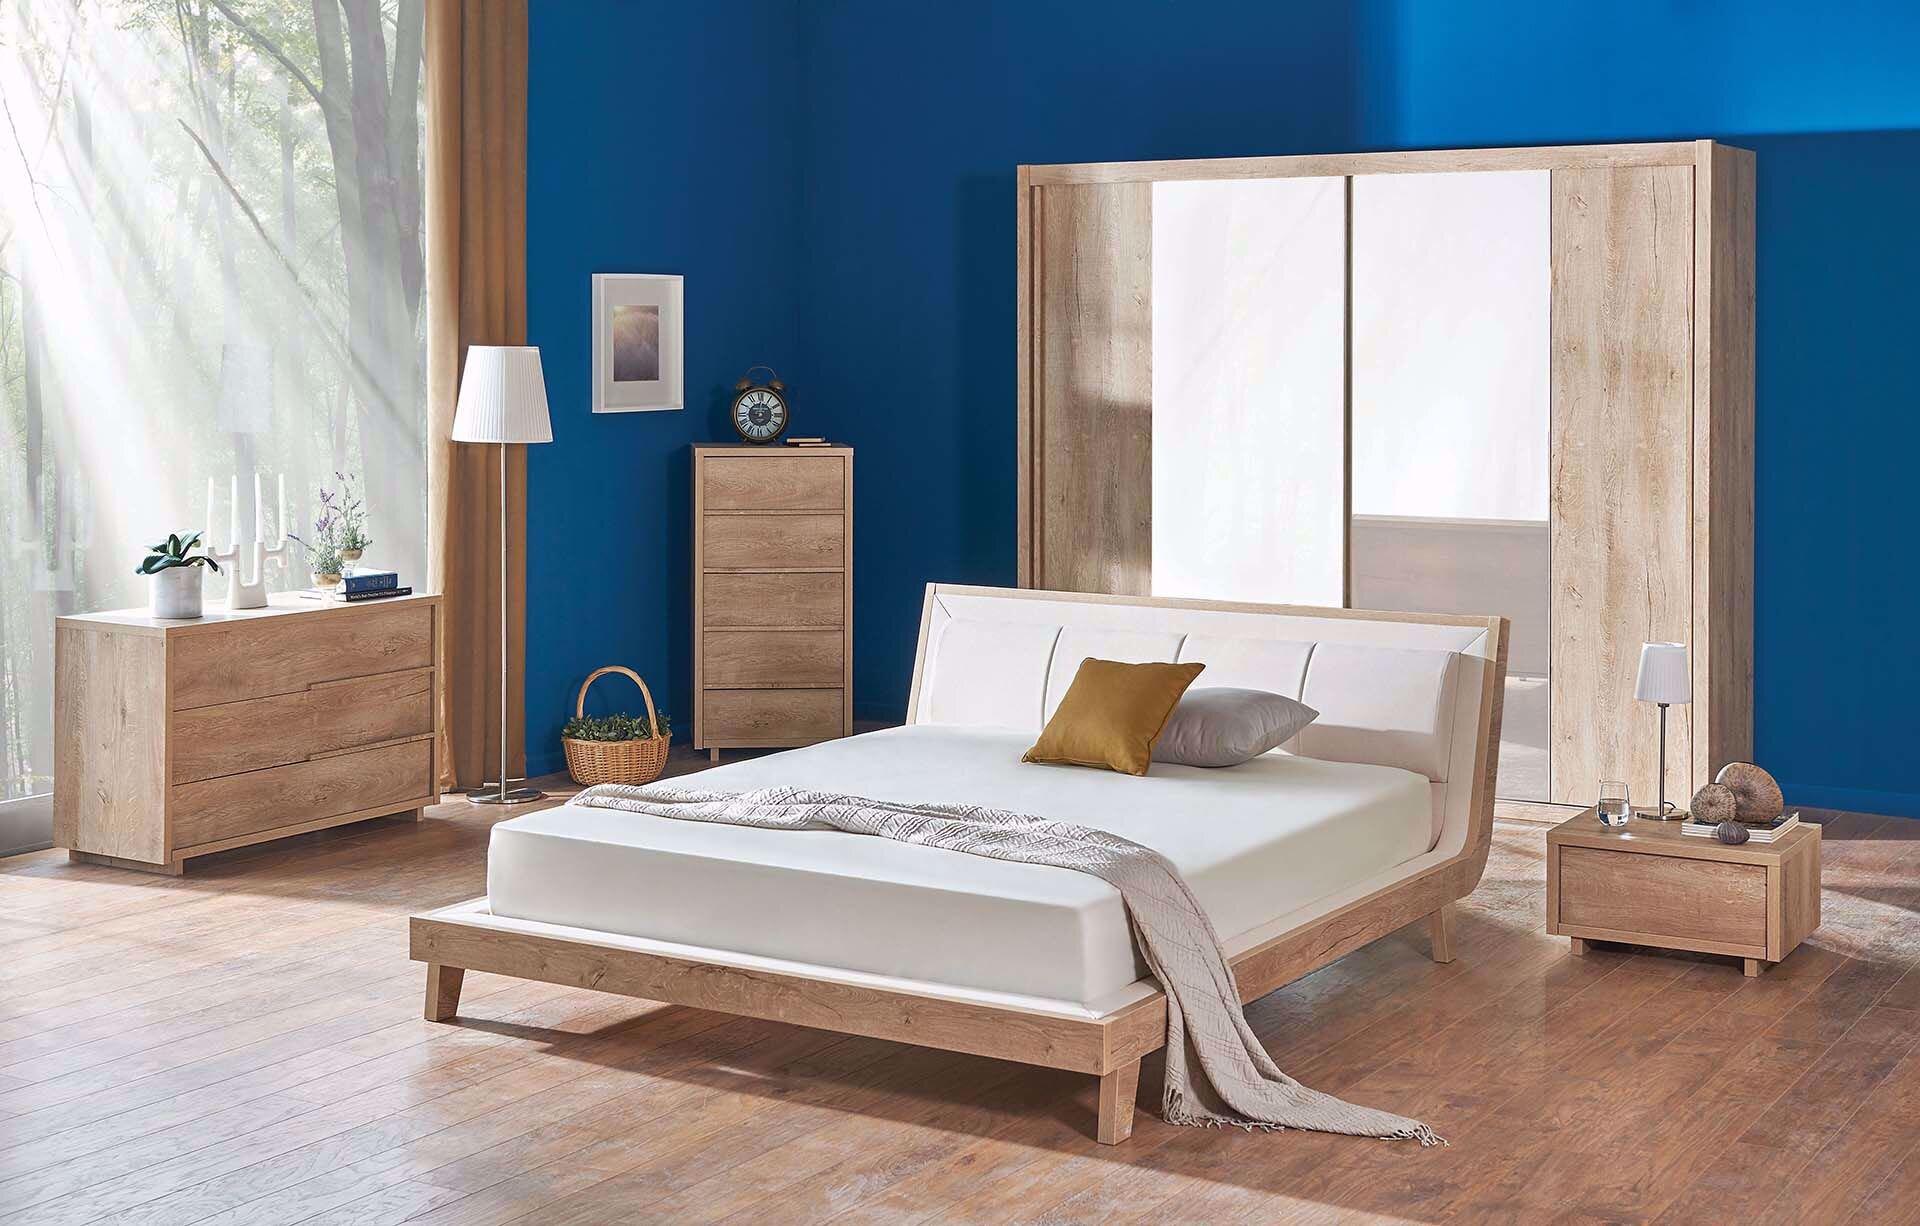 Nigero Bedroom Set